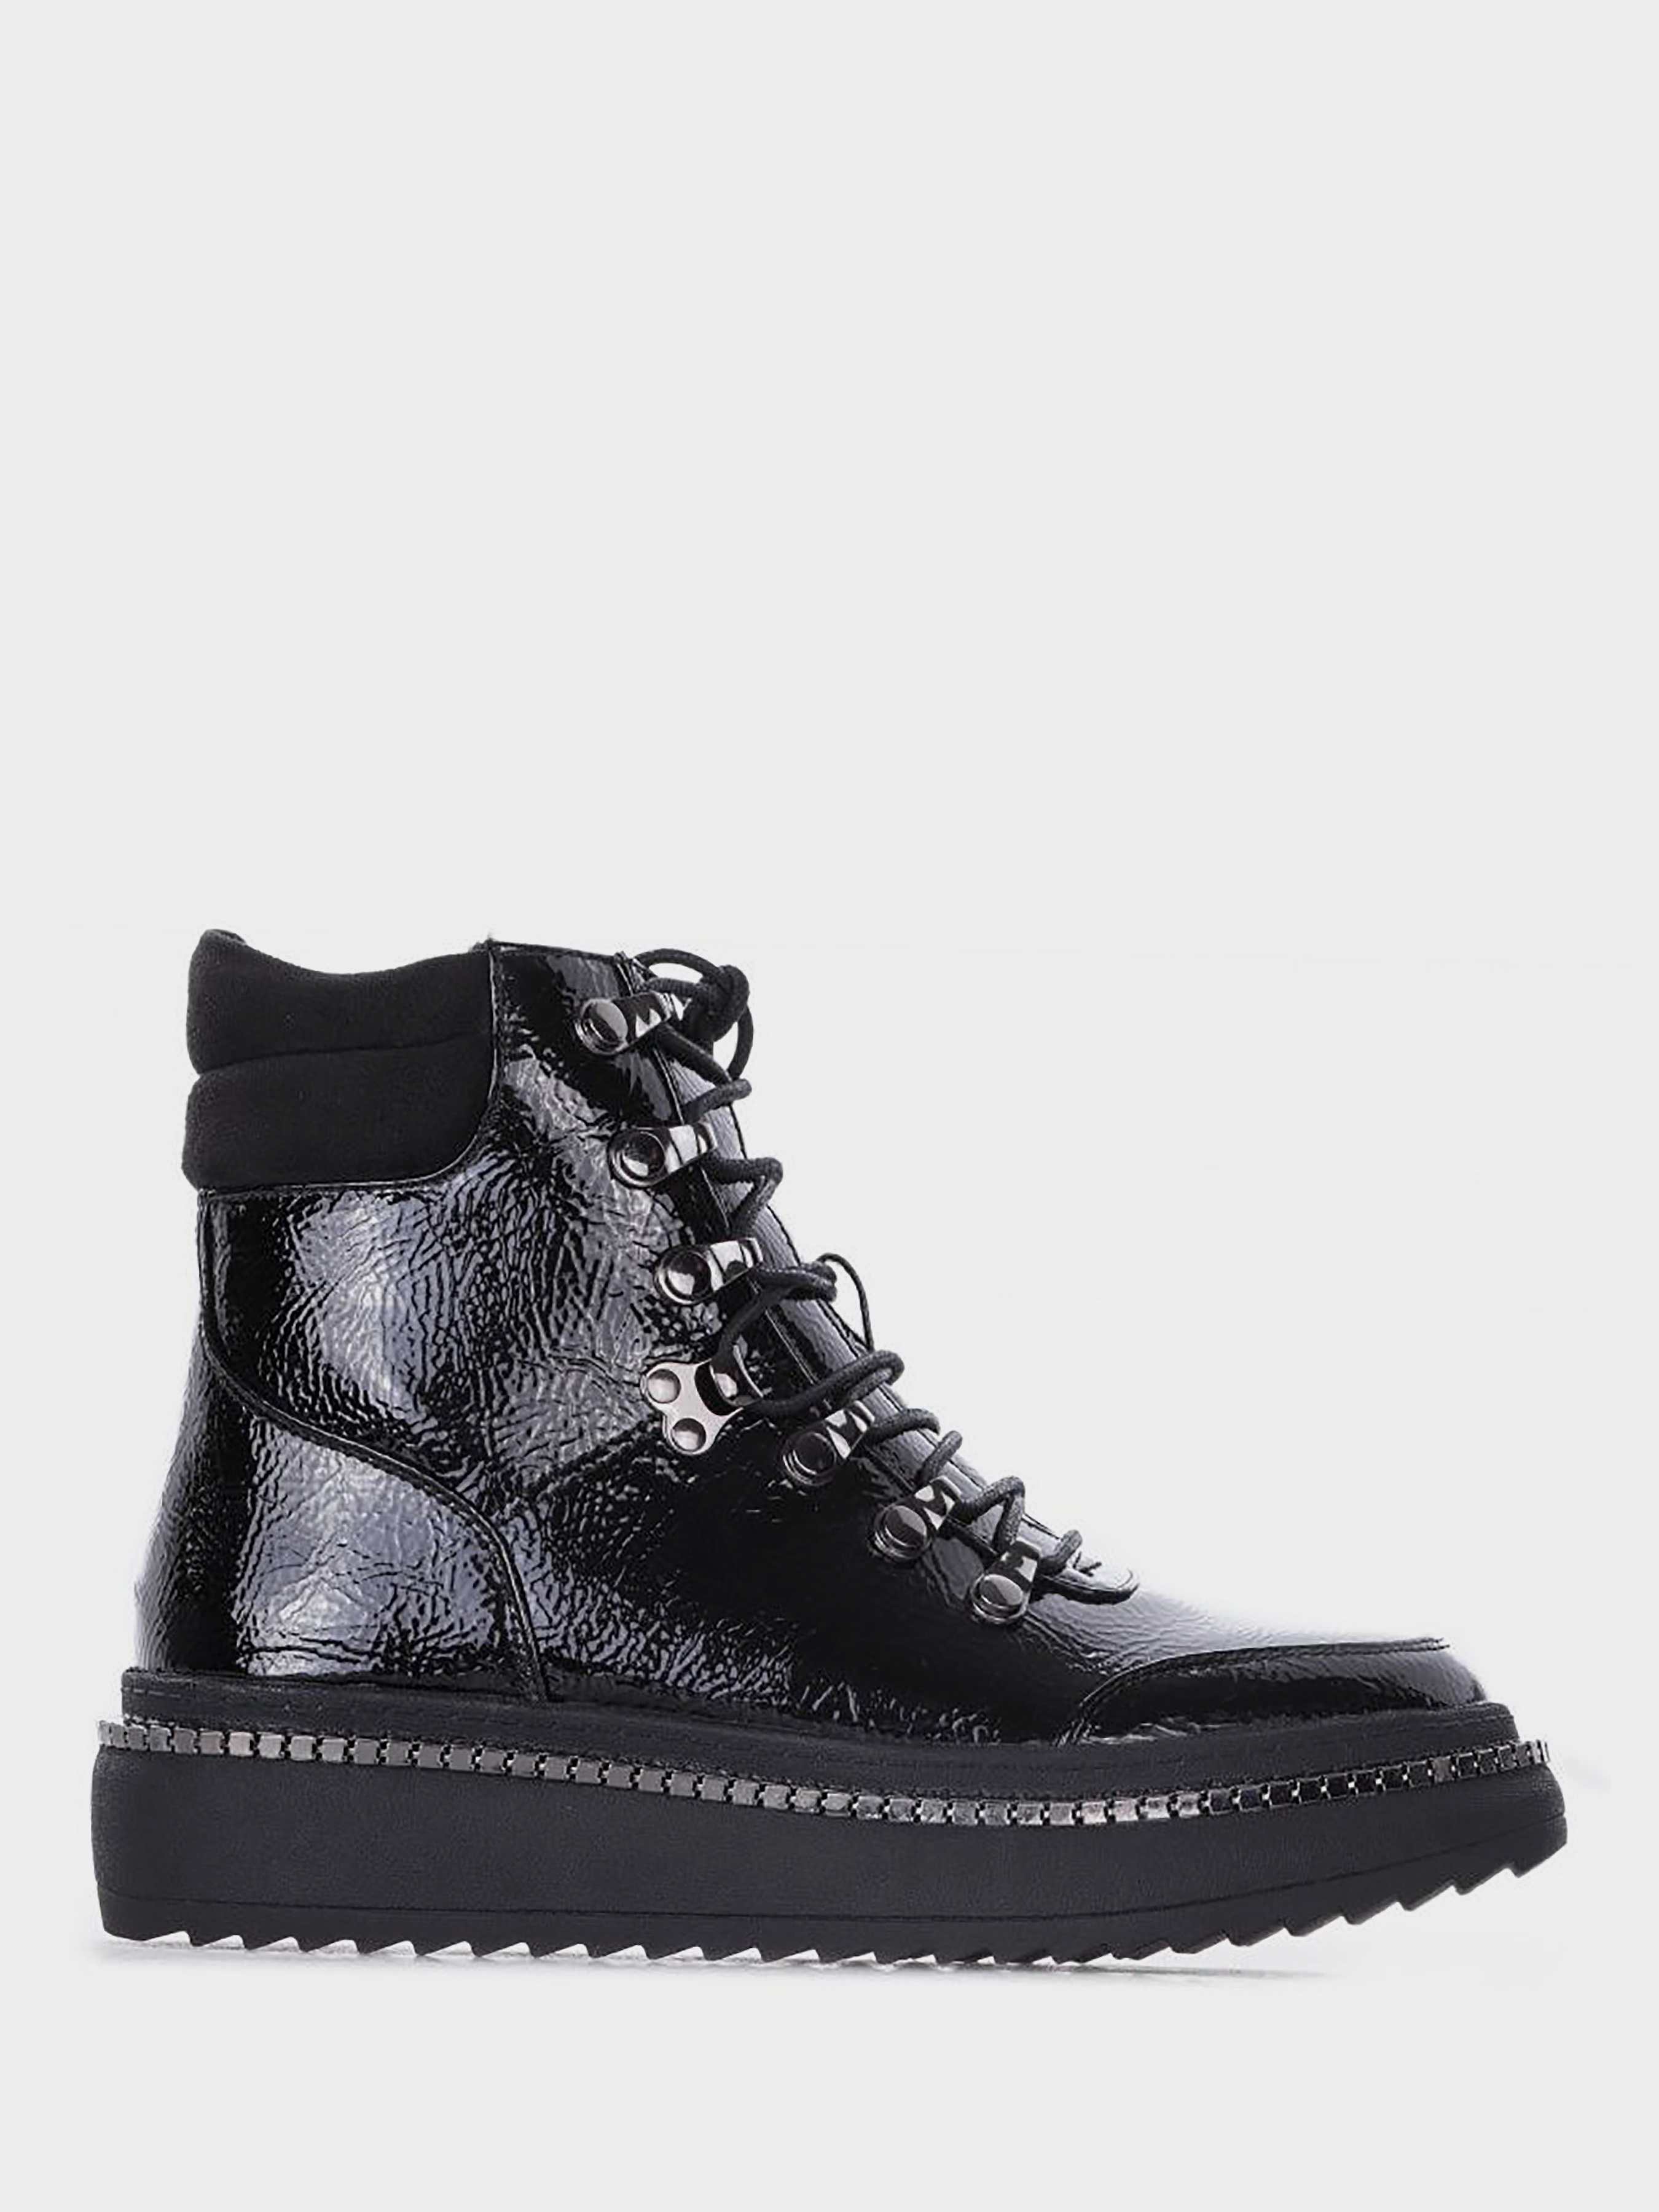 Ботинки для женщин INUOVO 5L13 примерка, 2017